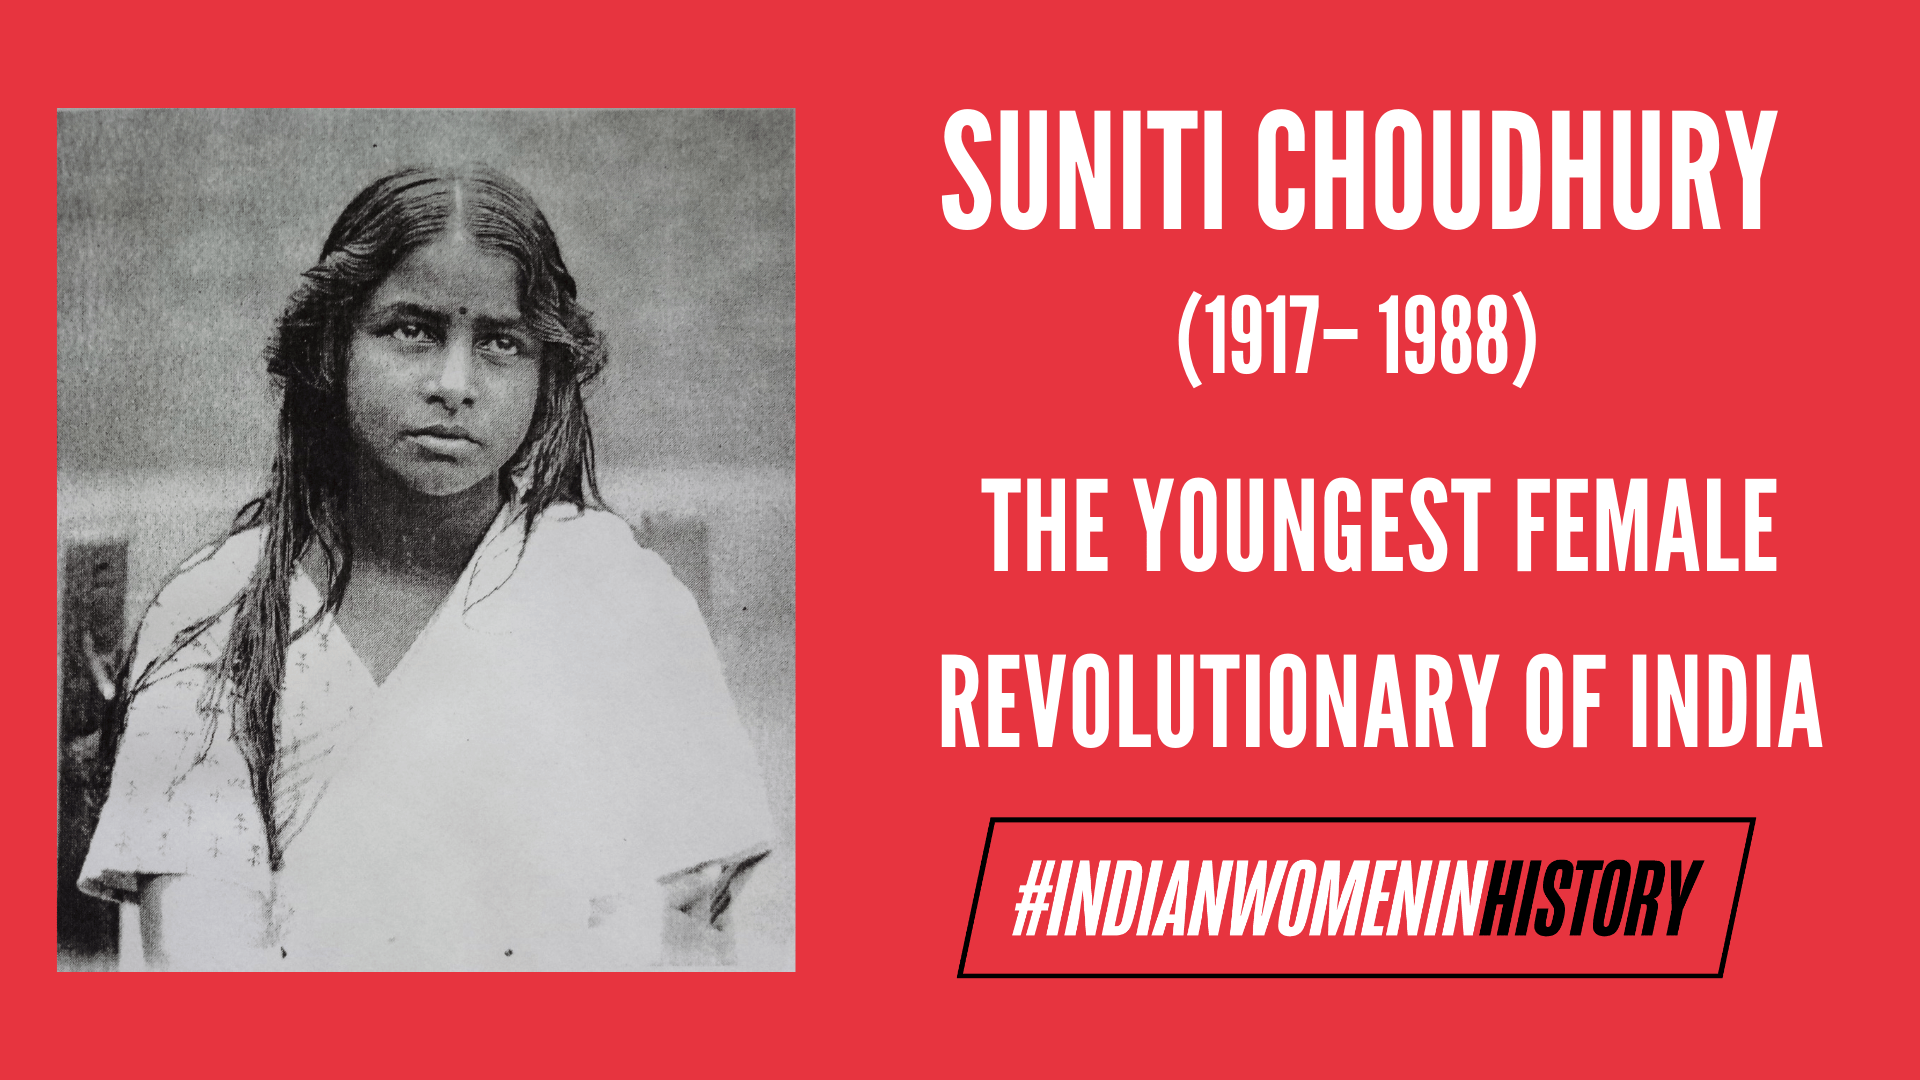 Suniti Choudhury: The Youngest Female Revolutionary Of India | #IndianWomenInHistory